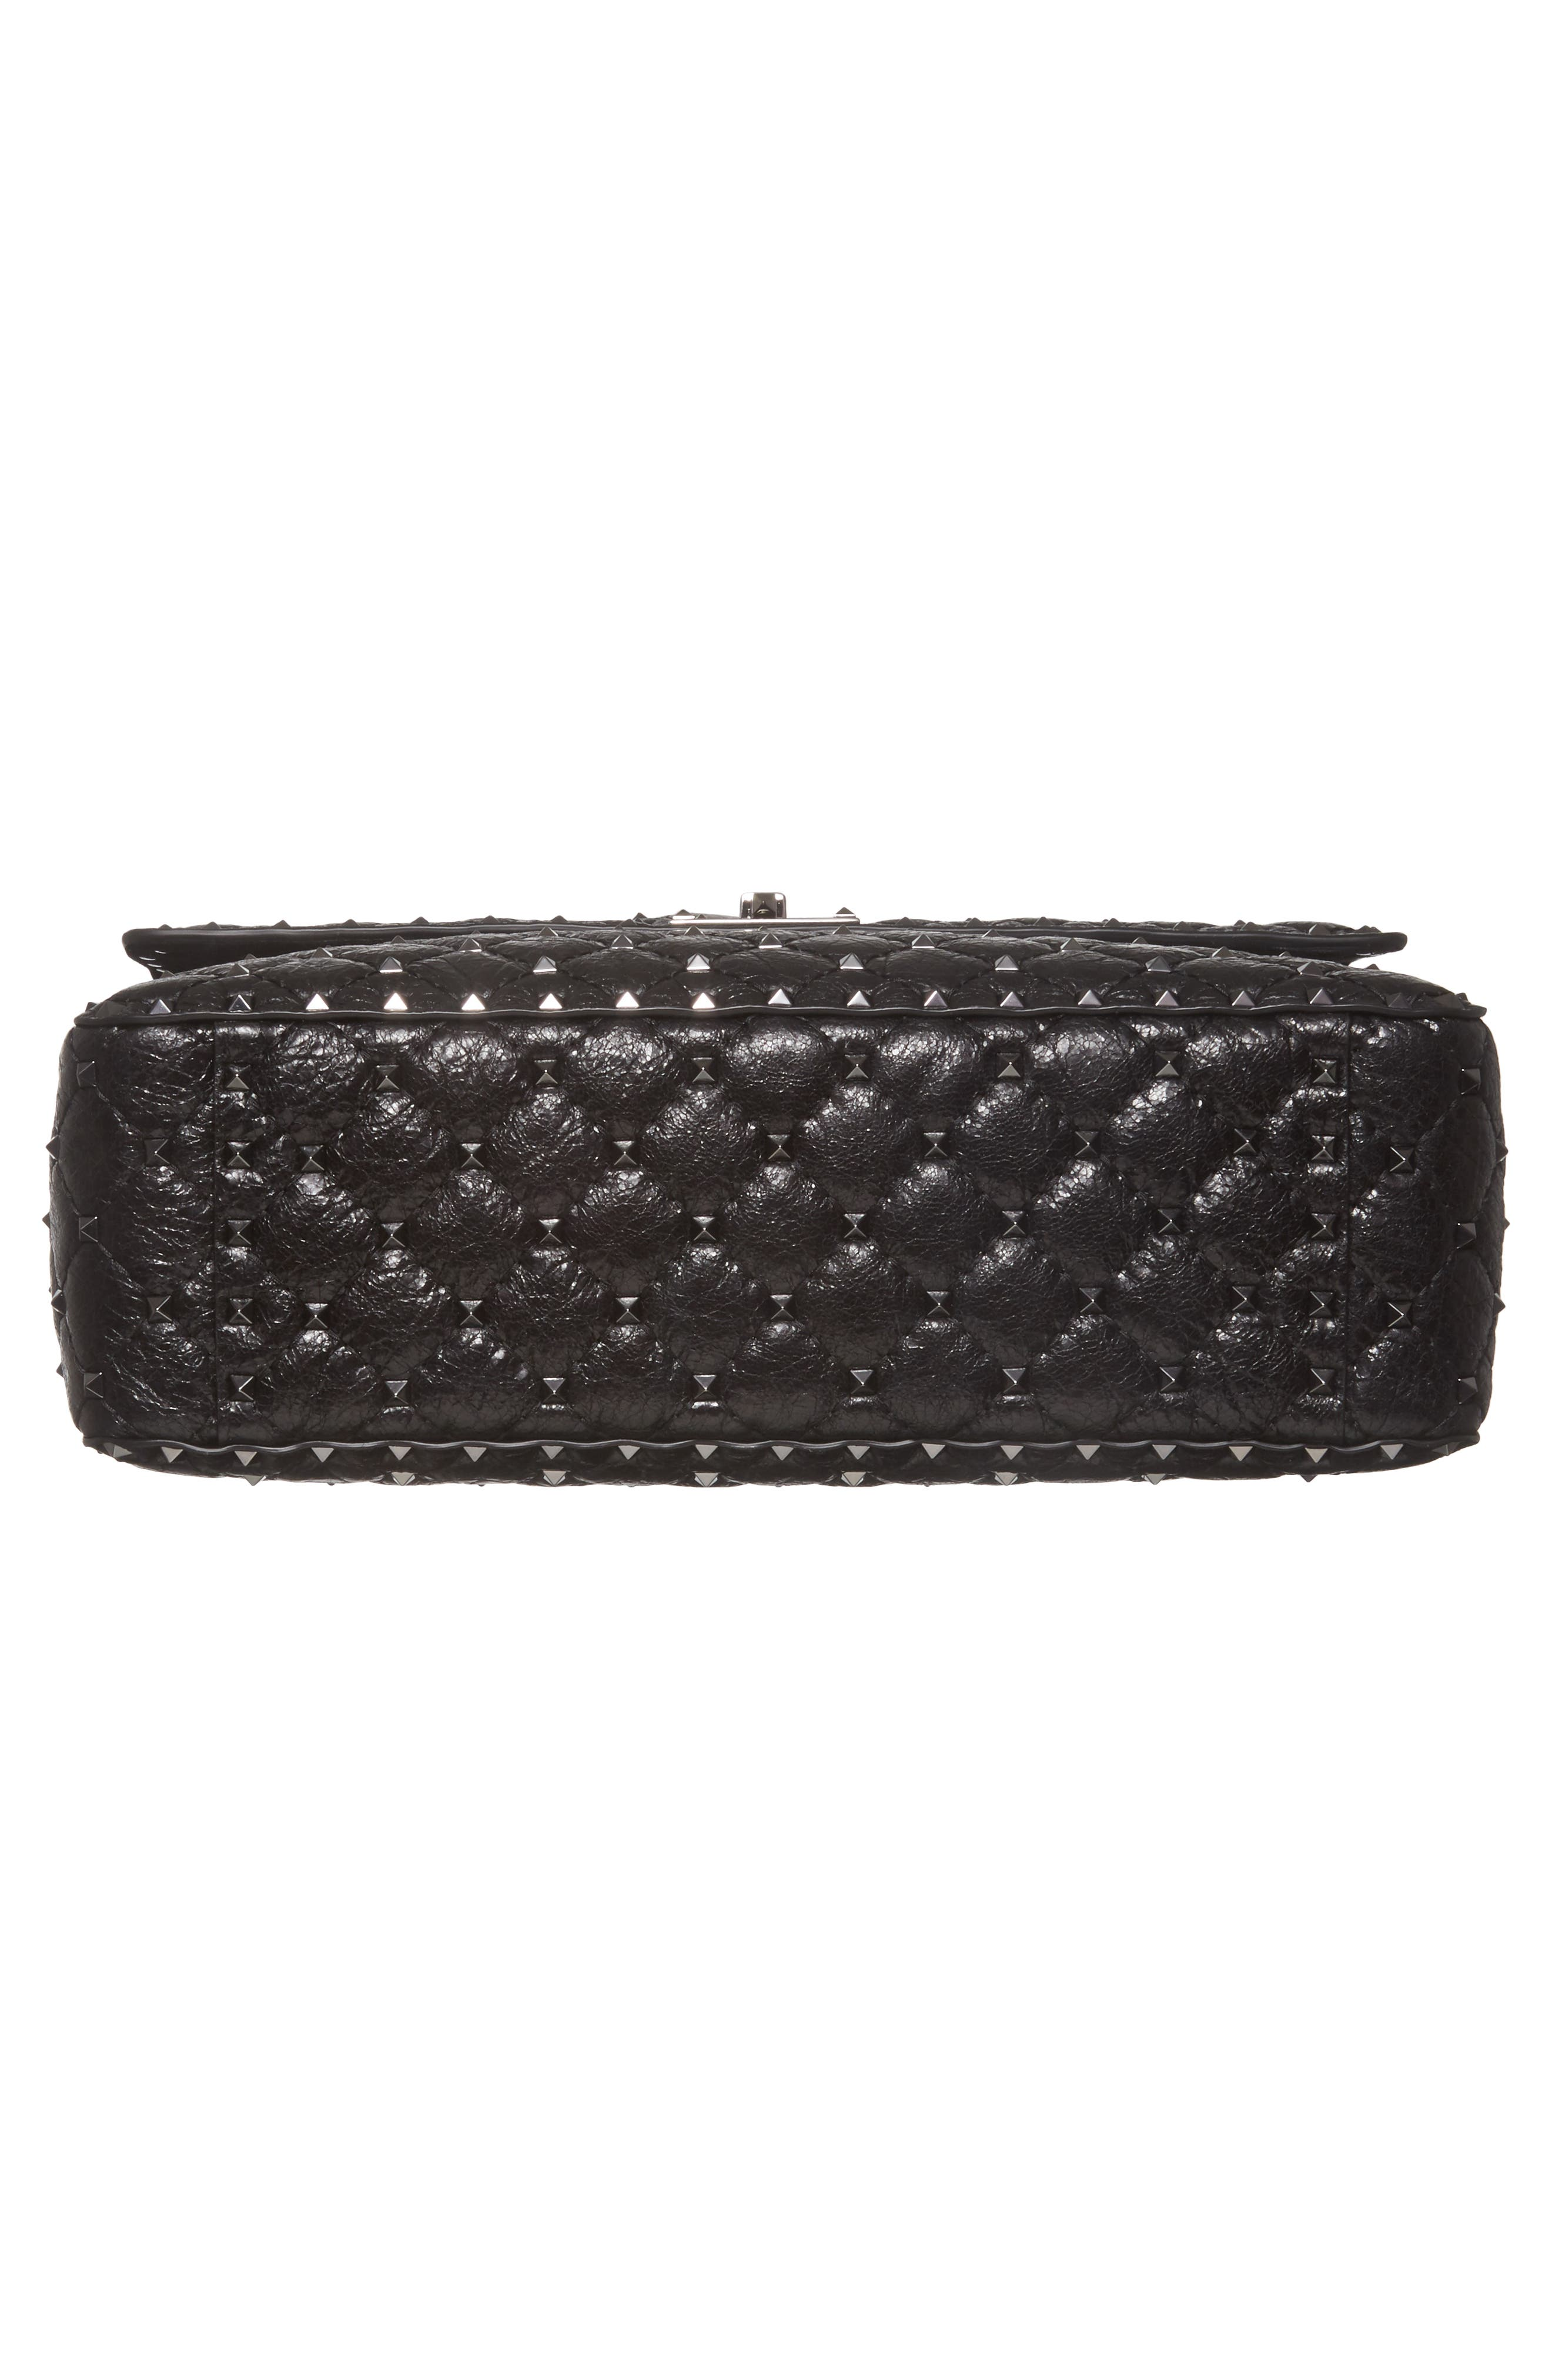 Vitello Rockstud Lambskin Leather Shoulder Bag,                             Alternate thumbnail 6, color,                             NERO